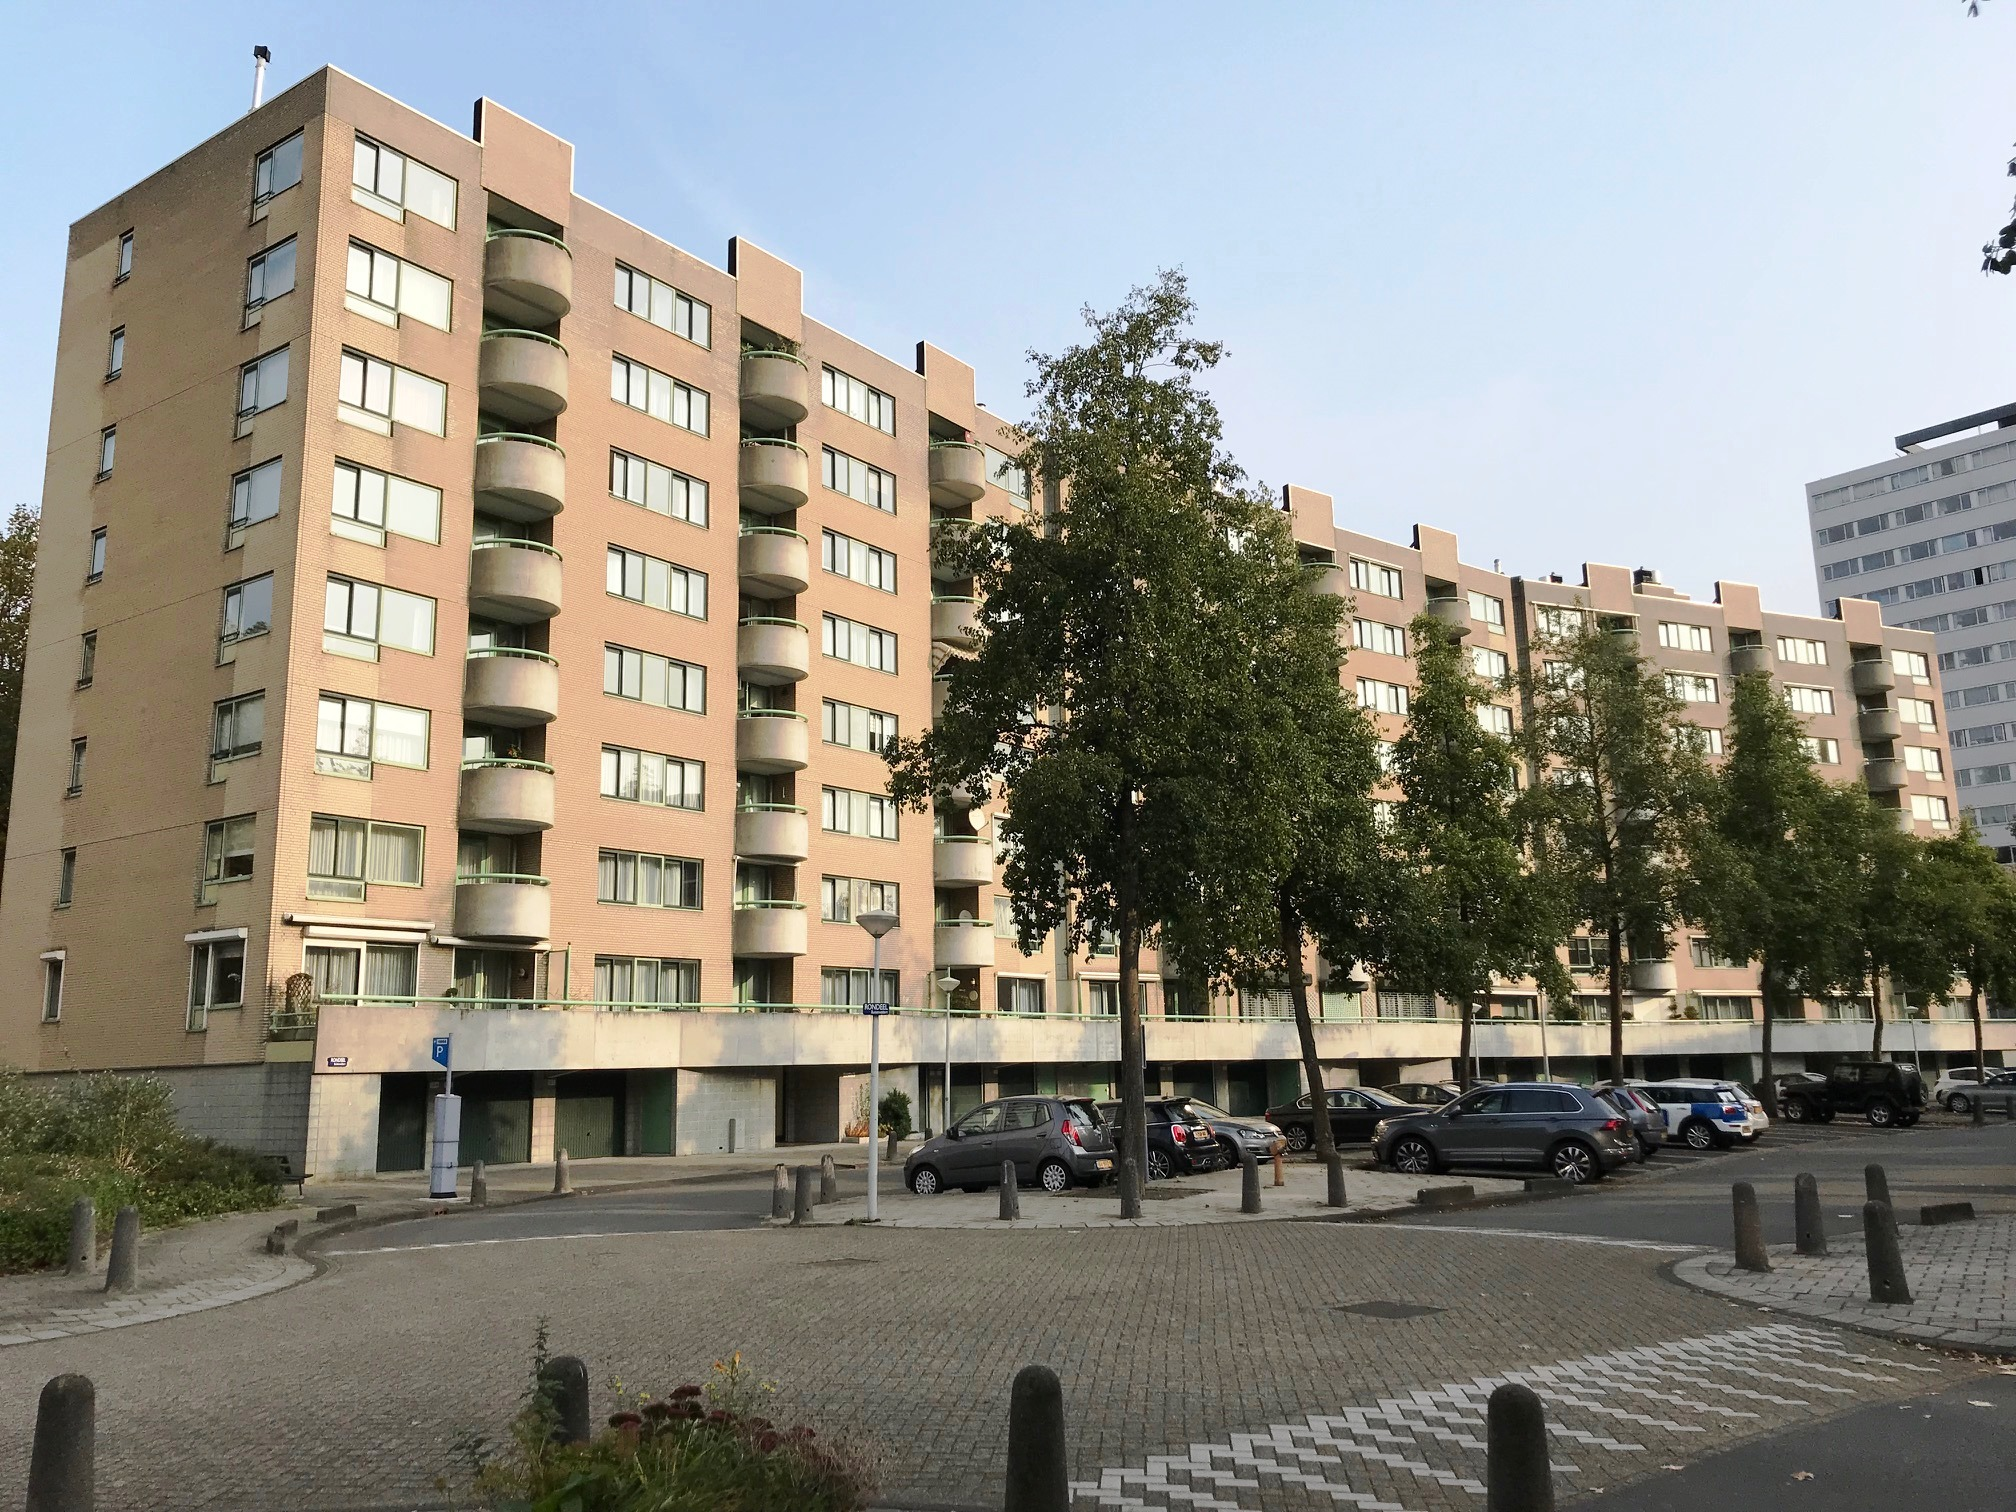 Rondeel, Amsterdam